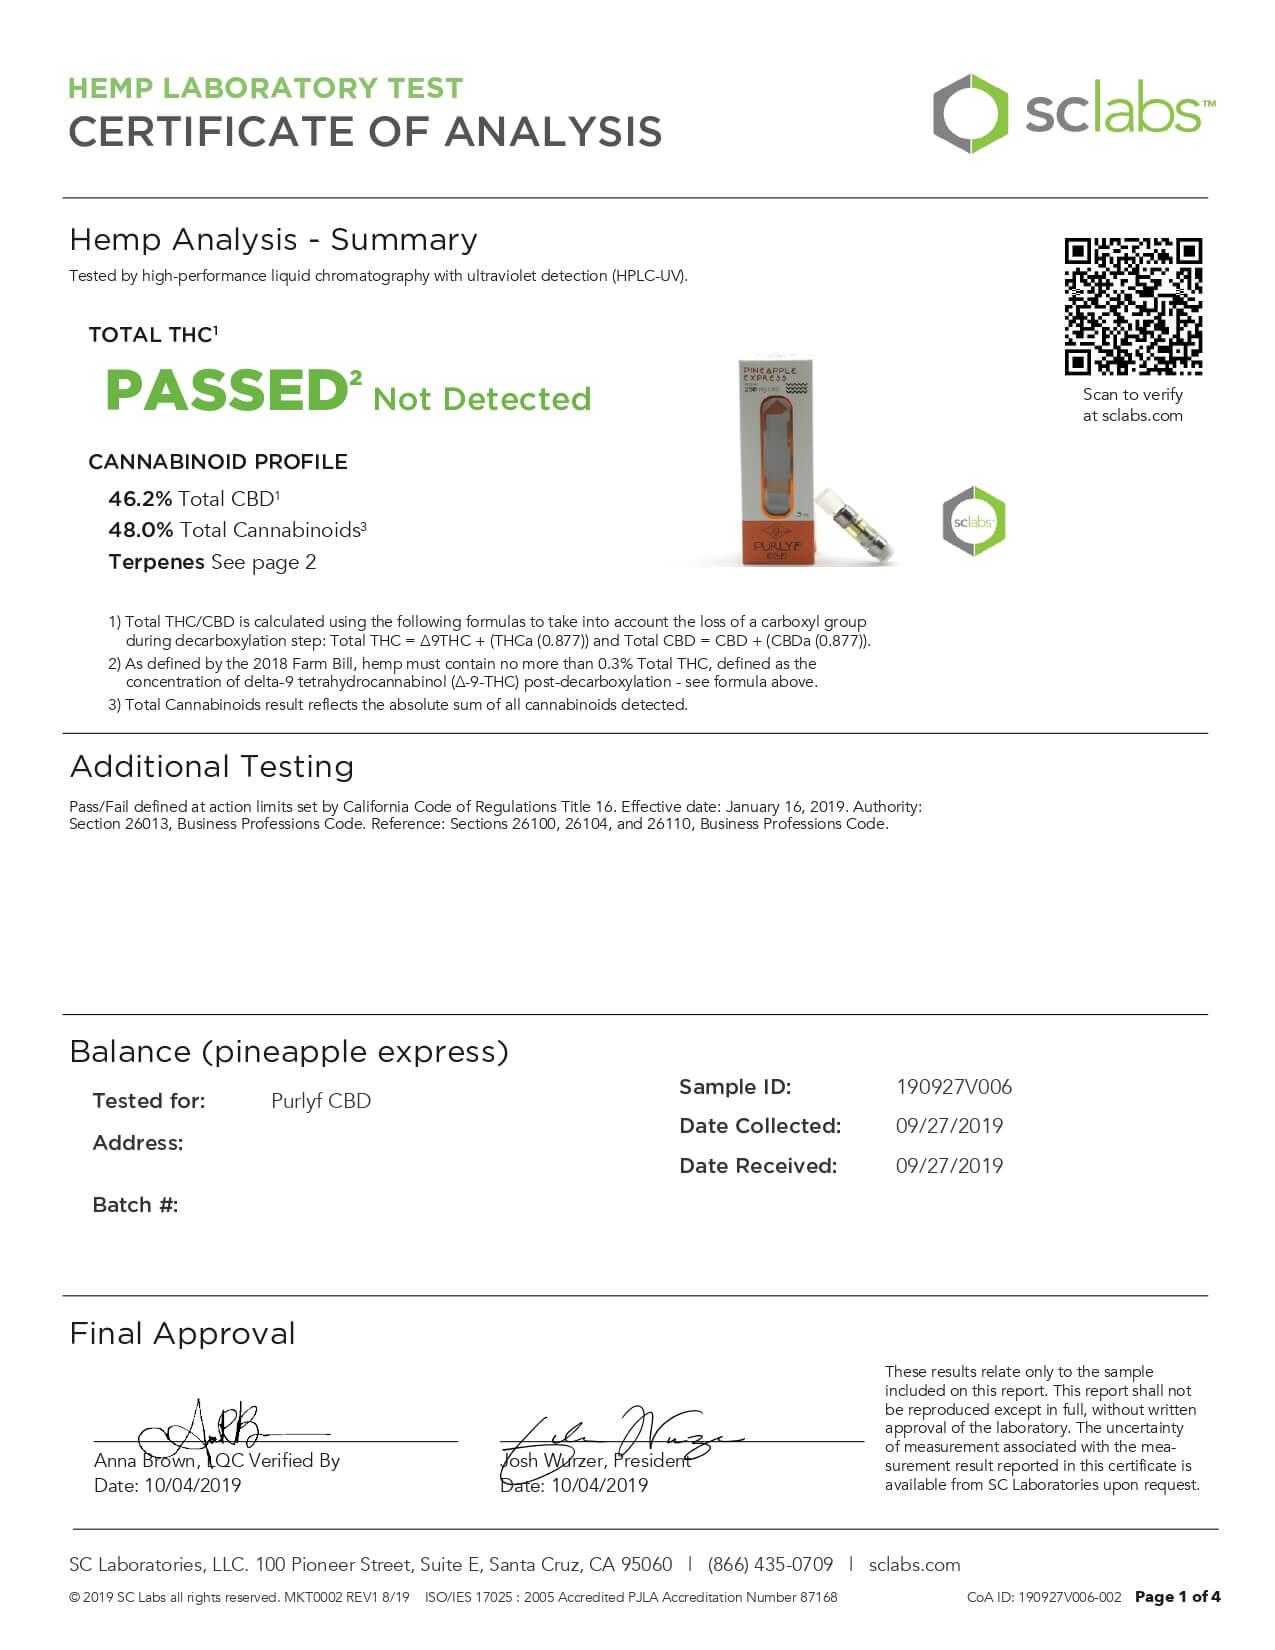 Purlyf CBD Cartridge Balance 200mg Lab Report